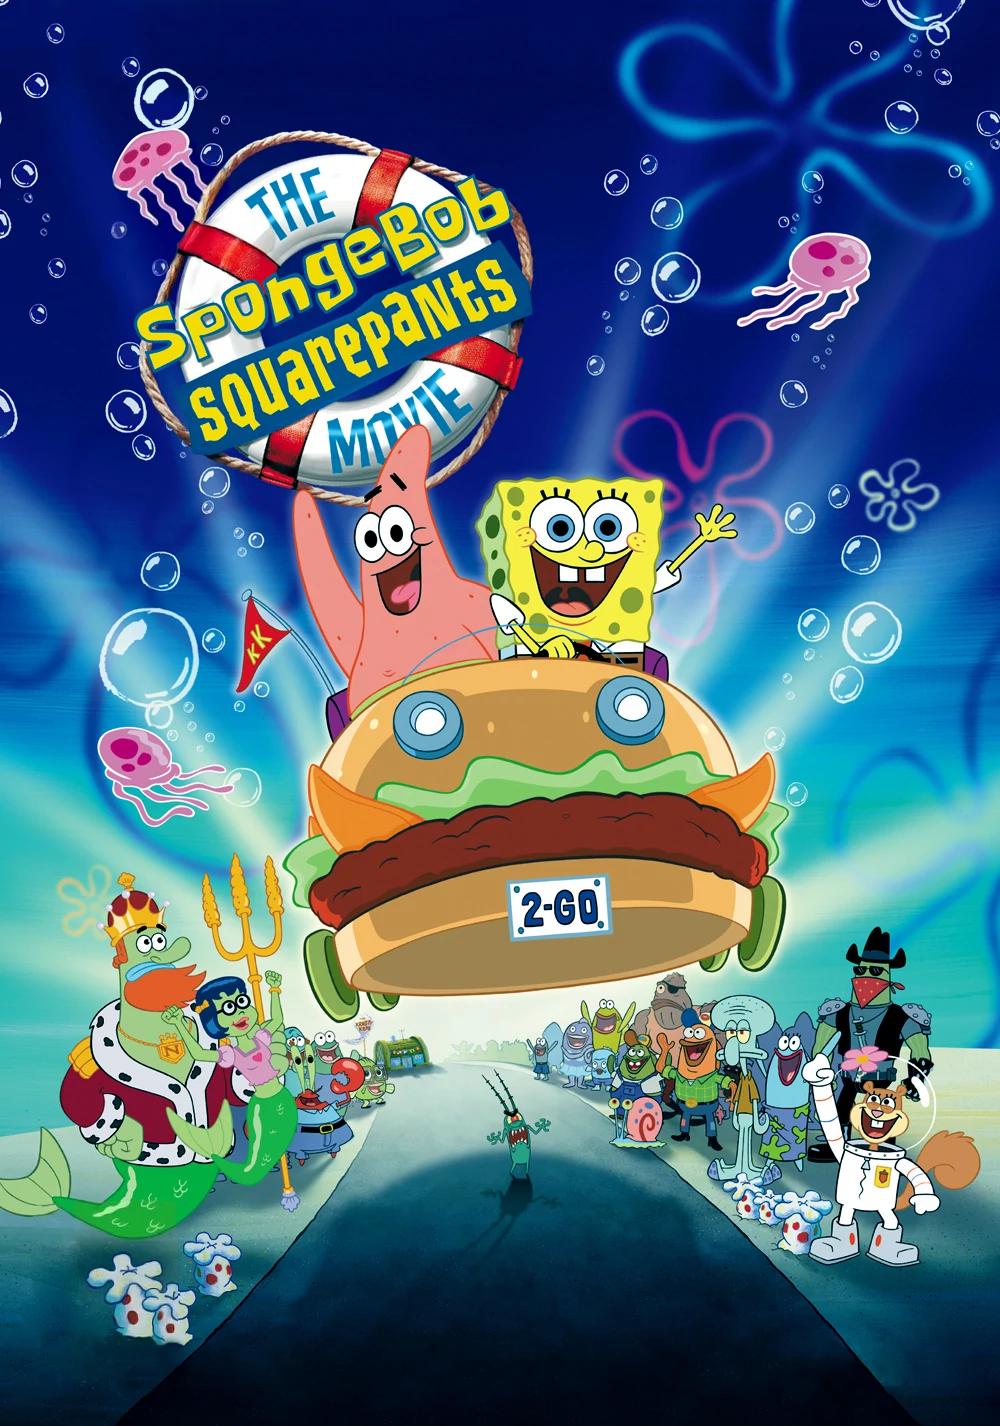 The SpongeBob SquarePants Movie (Flashback) Poster